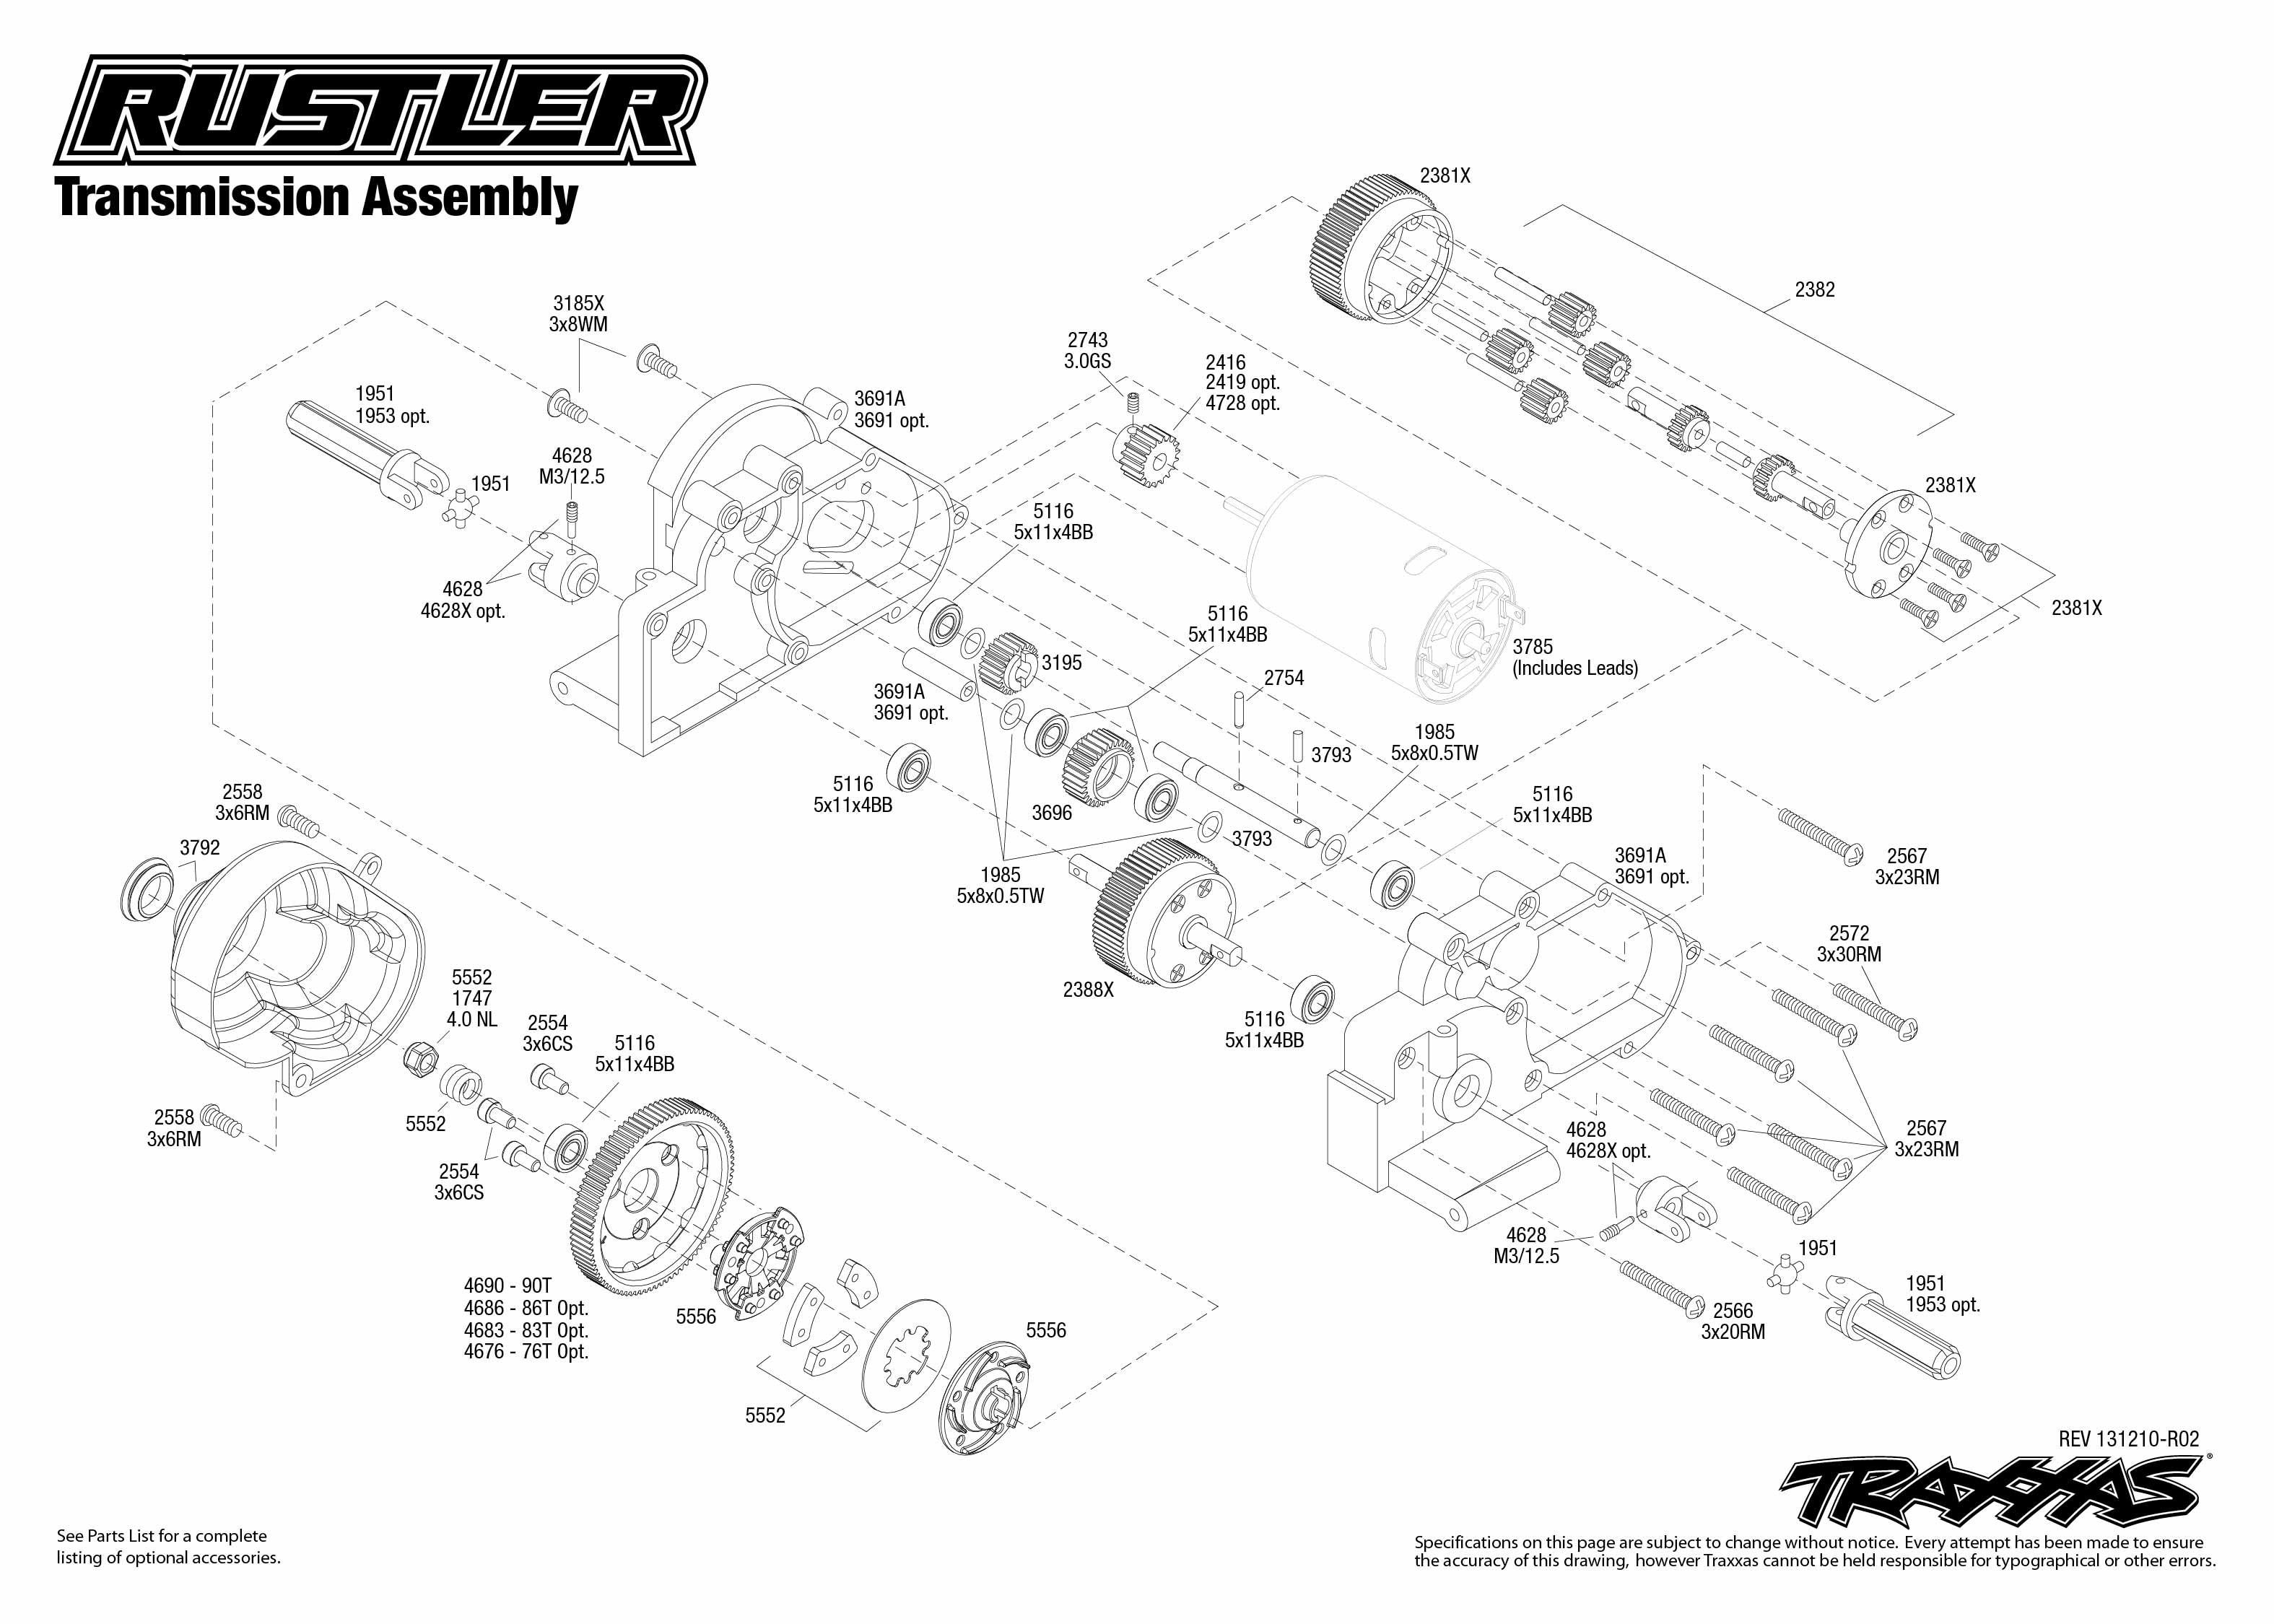 Car Body Part Diagram Image Result for Traxxas Rustler Parts Diagram Of Car  Body Part Diagram